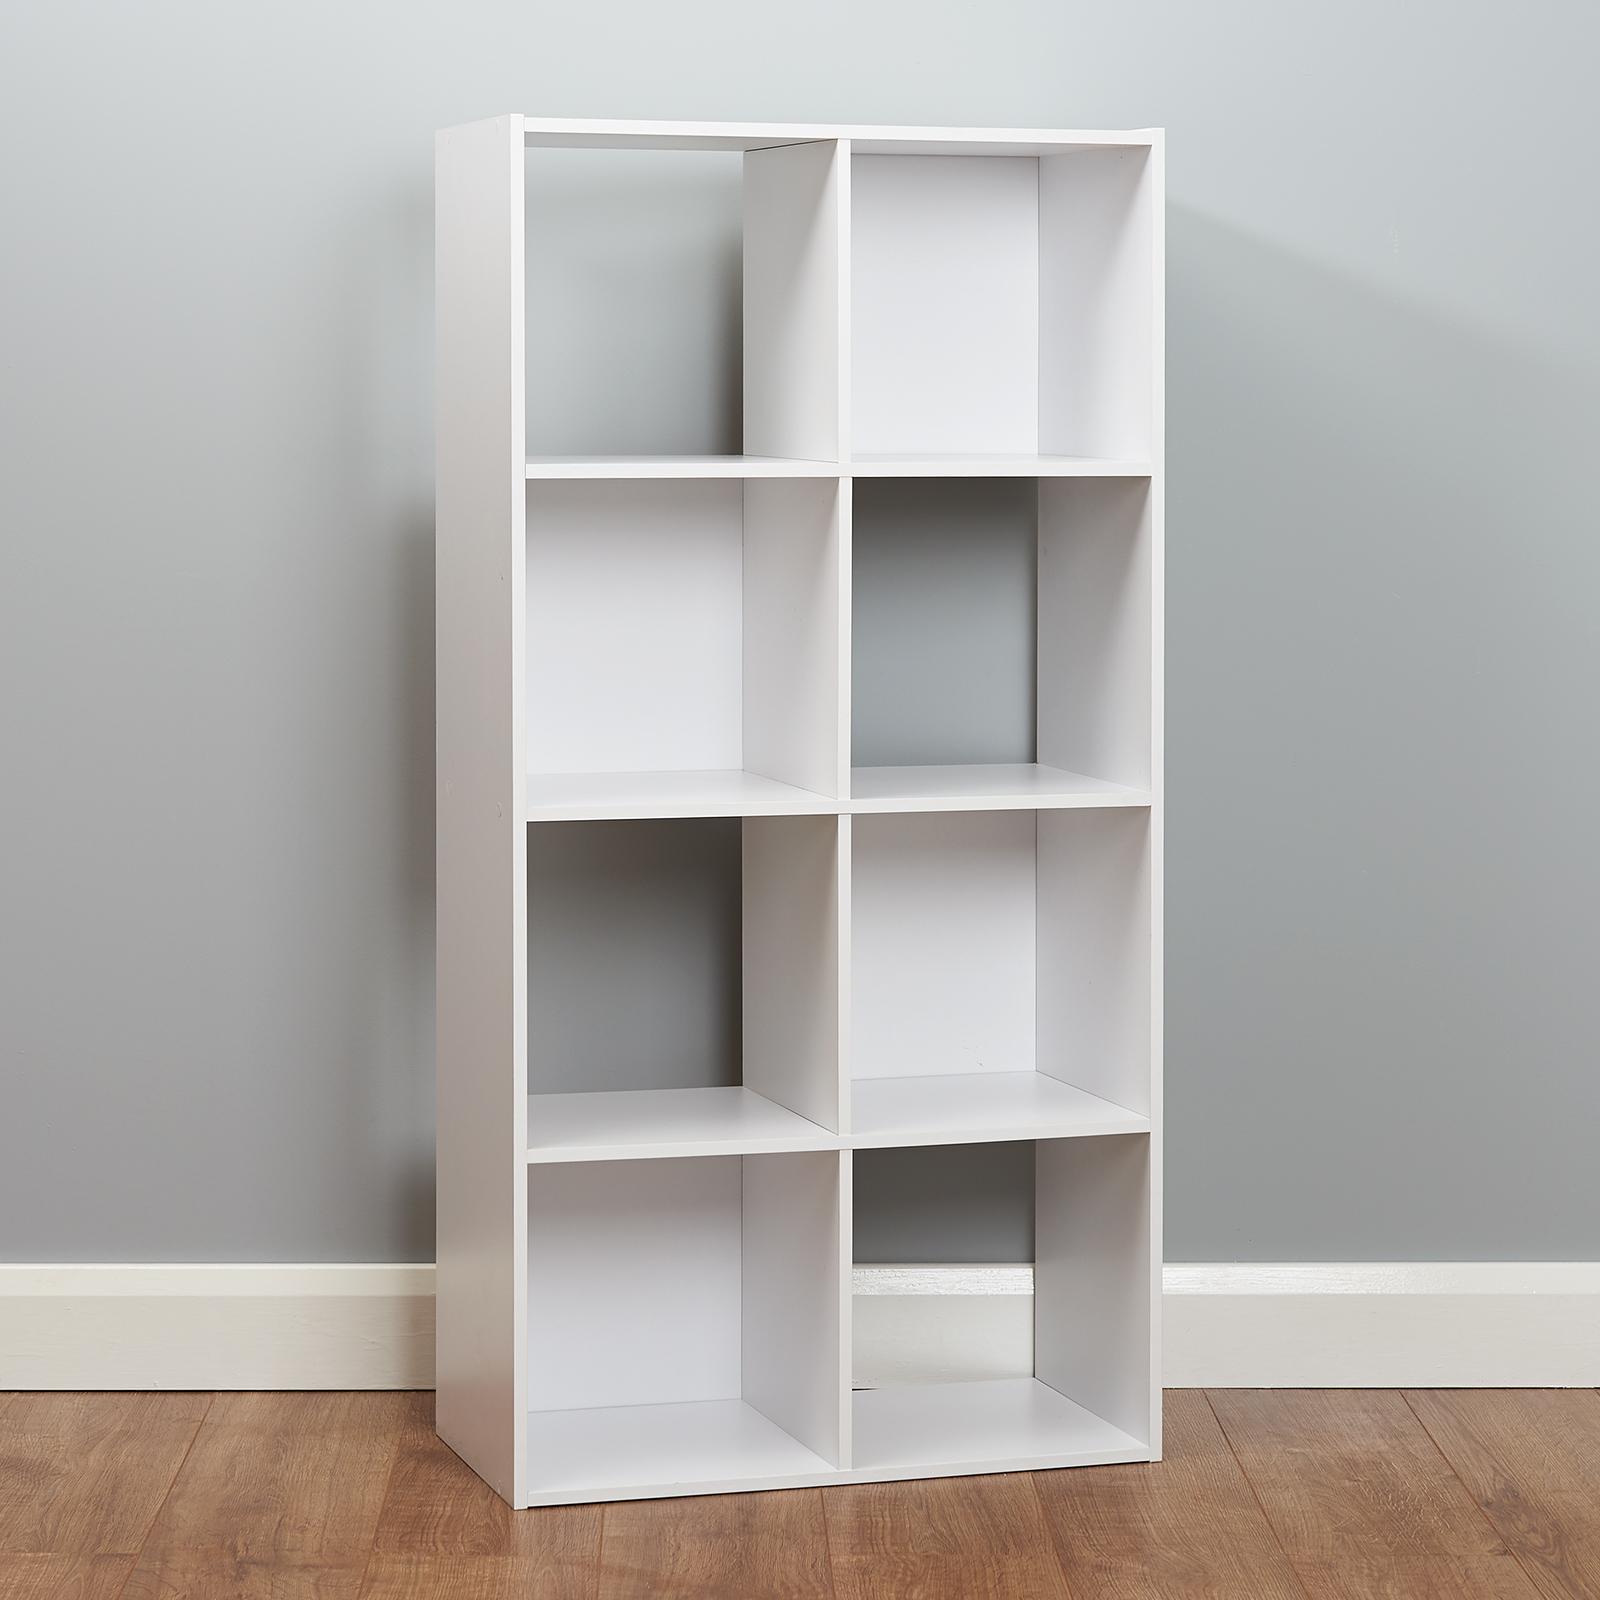 6 Cube Kids White Toy Games Storage Unit Girls Boys Childs: White 8 Cube Storage Unit Kids/Childrens Bedroom Shelves